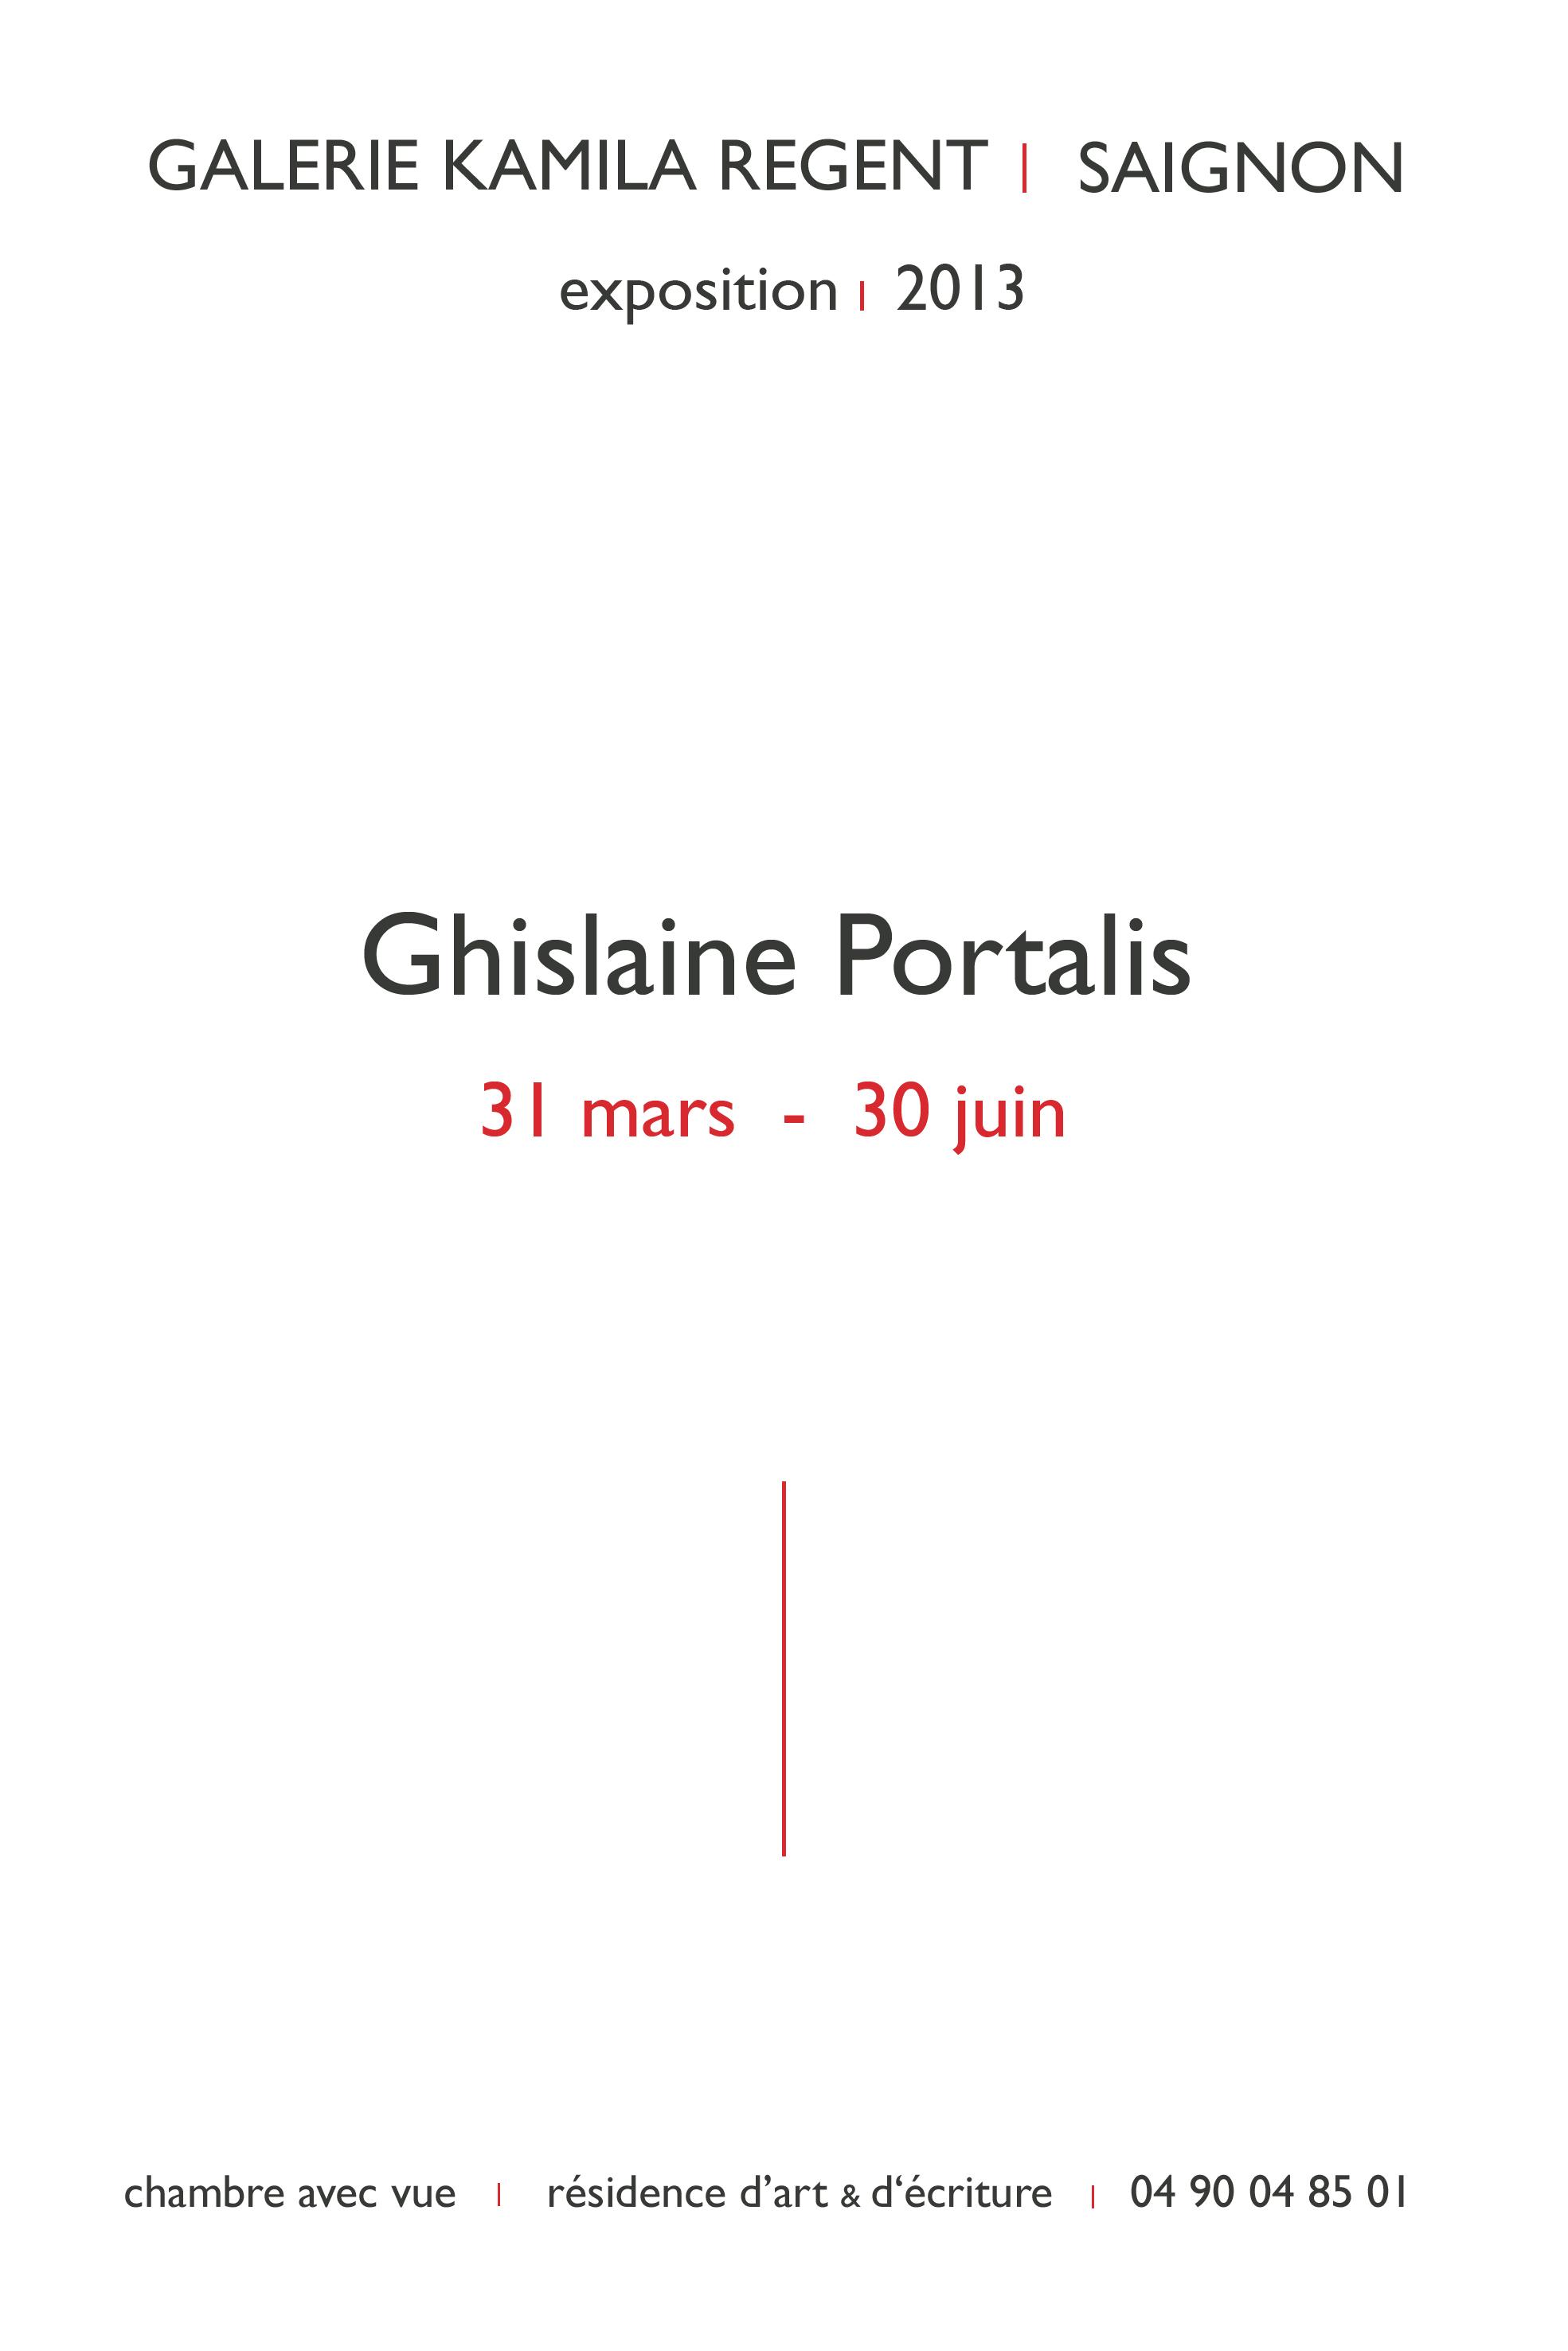 Ghislaine Portalis | Galerie Regent